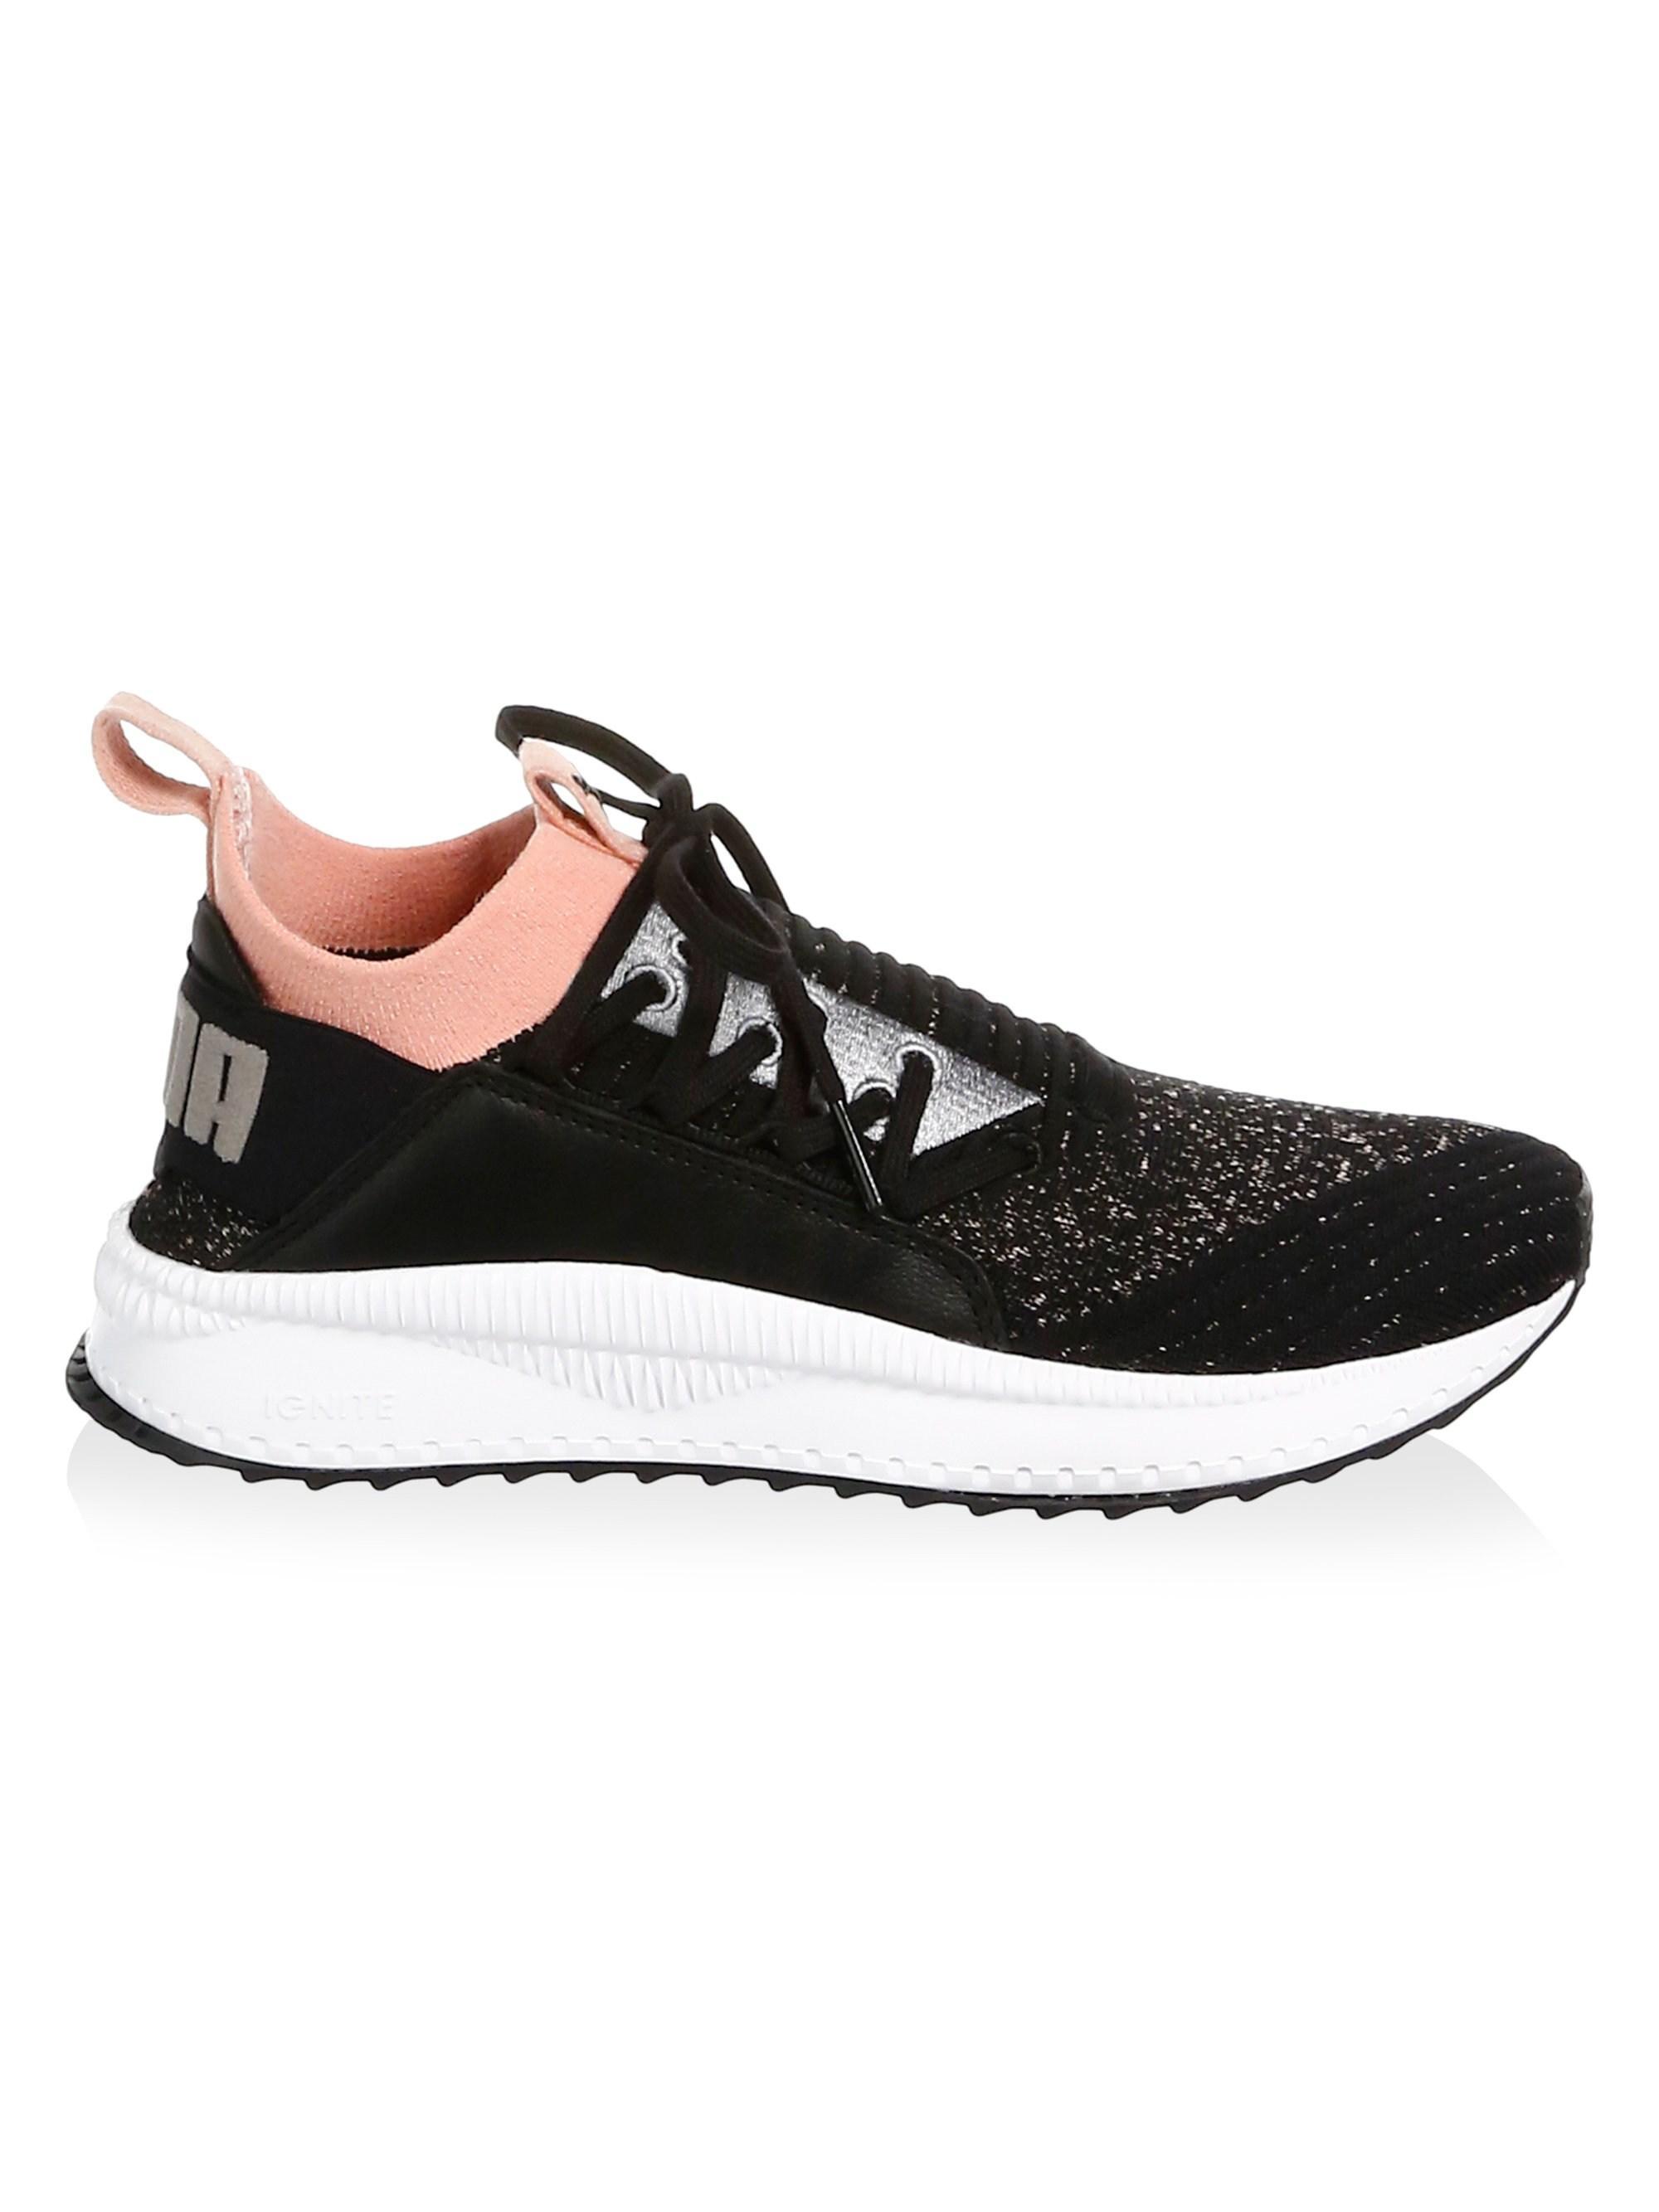 Lyst - PUMA Women s Tsugi Shinsei Knit Fabric Running Sneakers ... 0889005d2